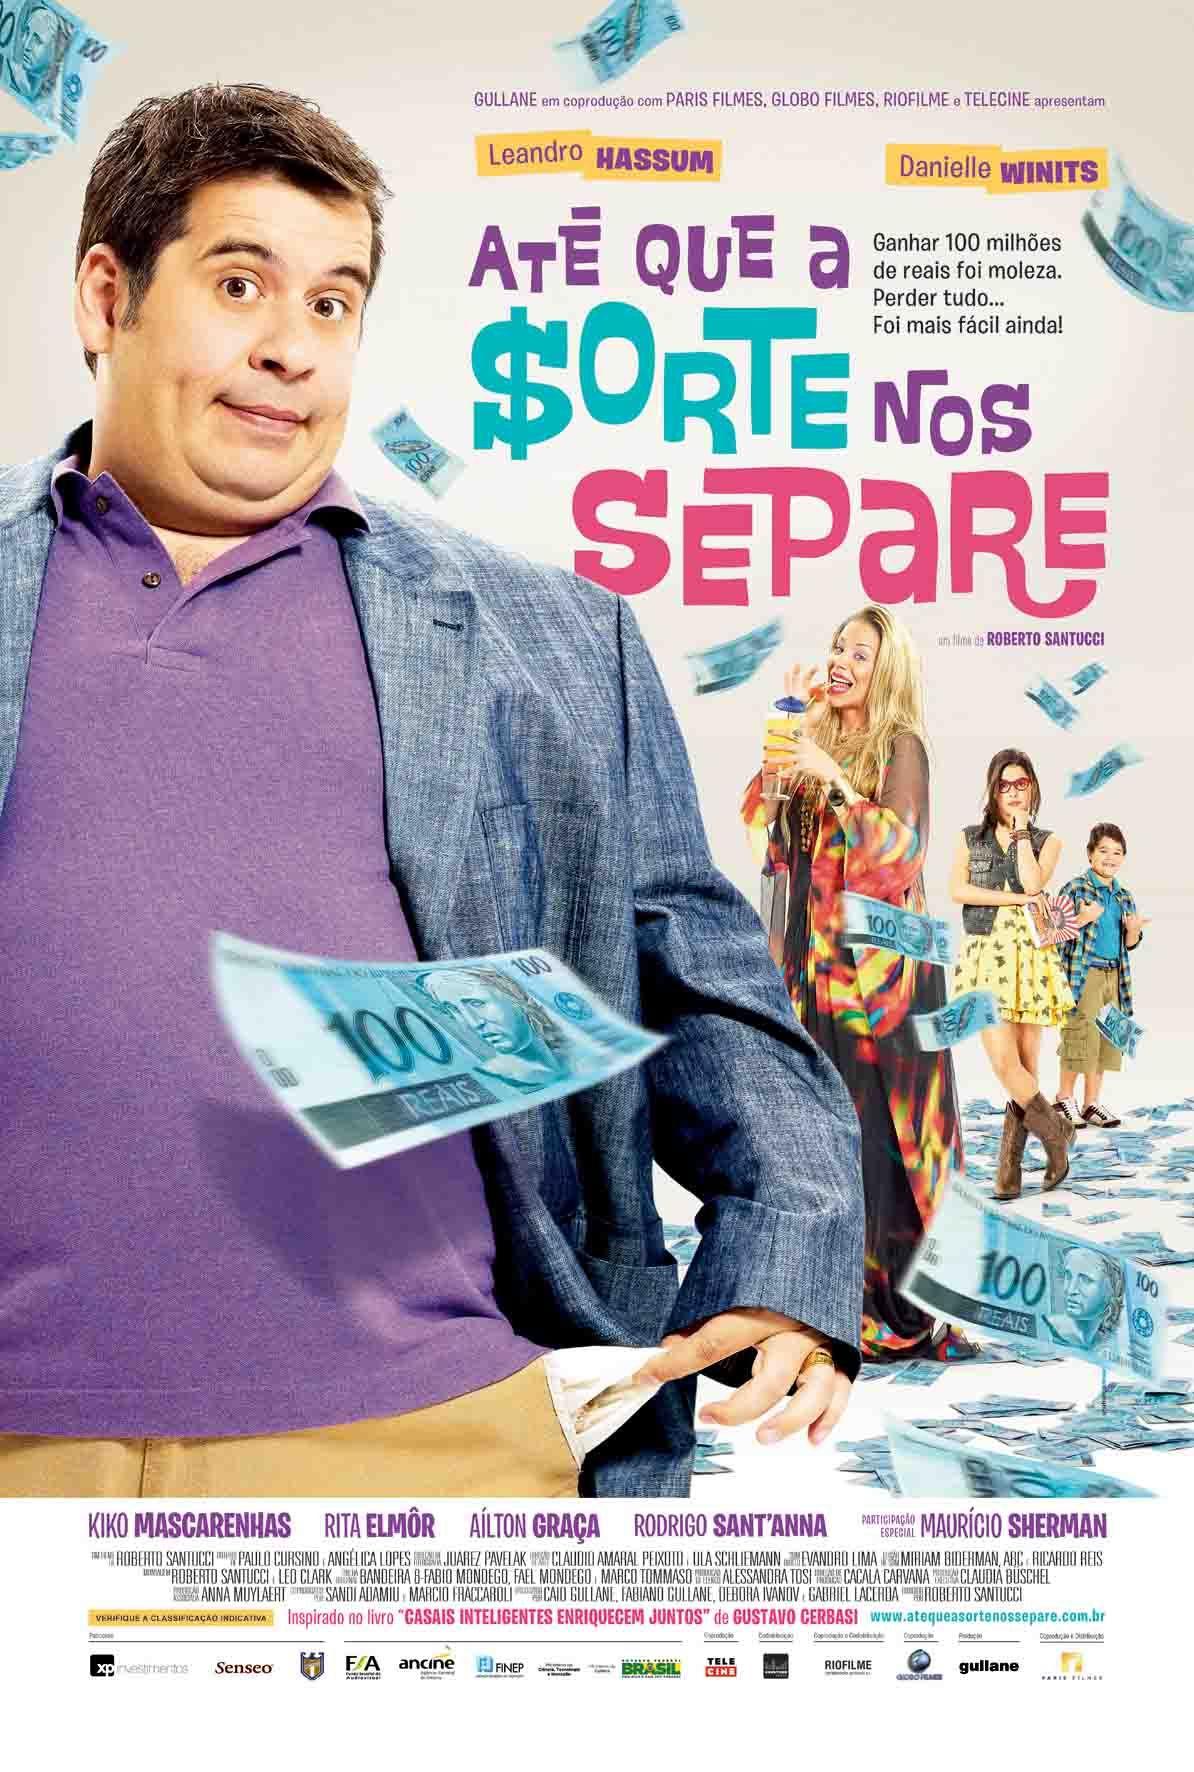 Ri Litros Filmes Brasileiros Filmes Cinema